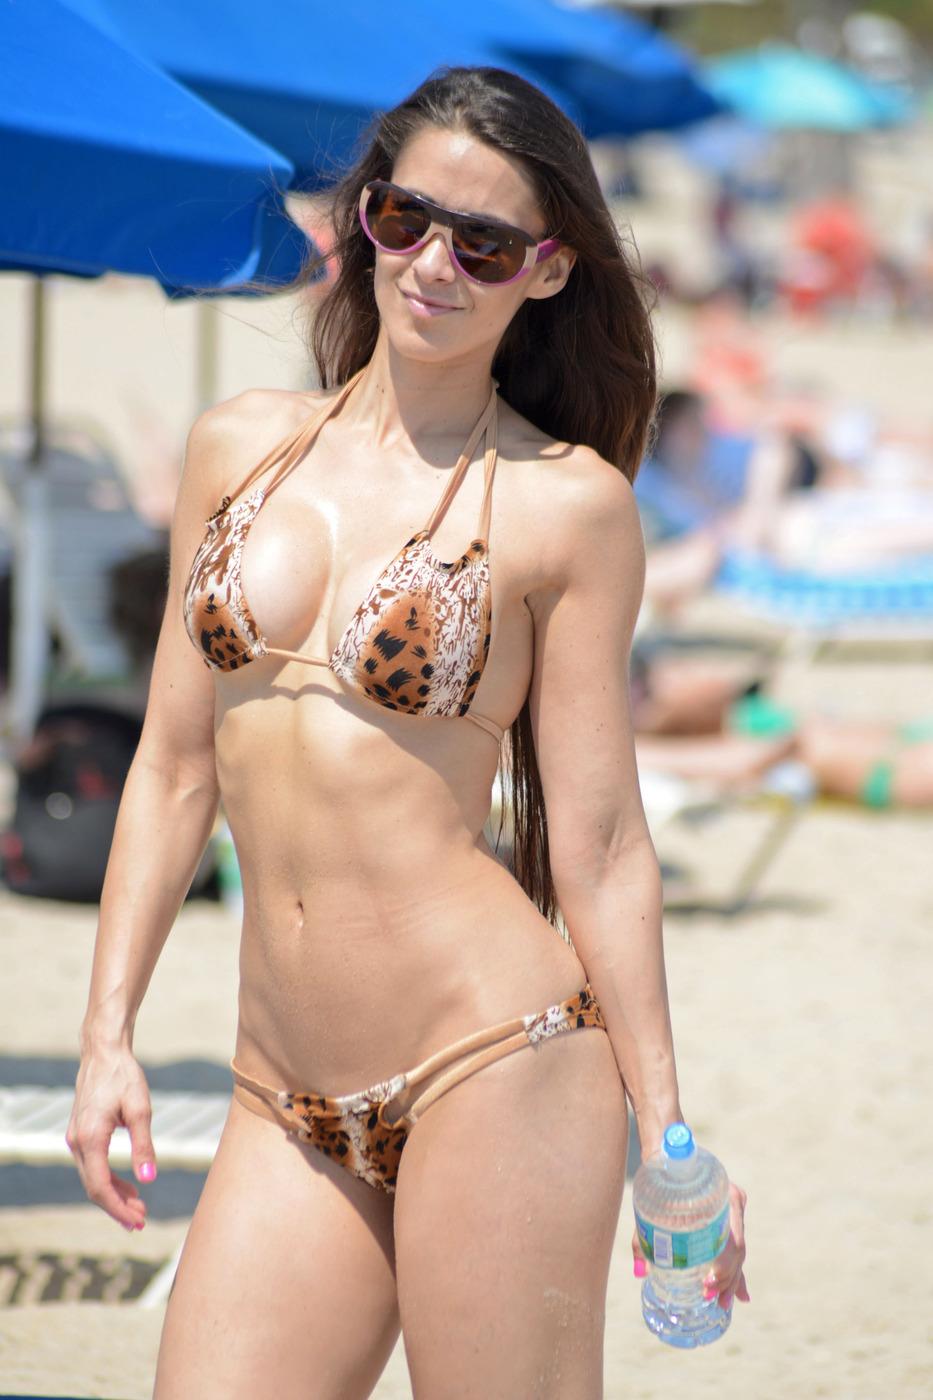 anais-zanotti-wearing-a-bikini-in-miami-9